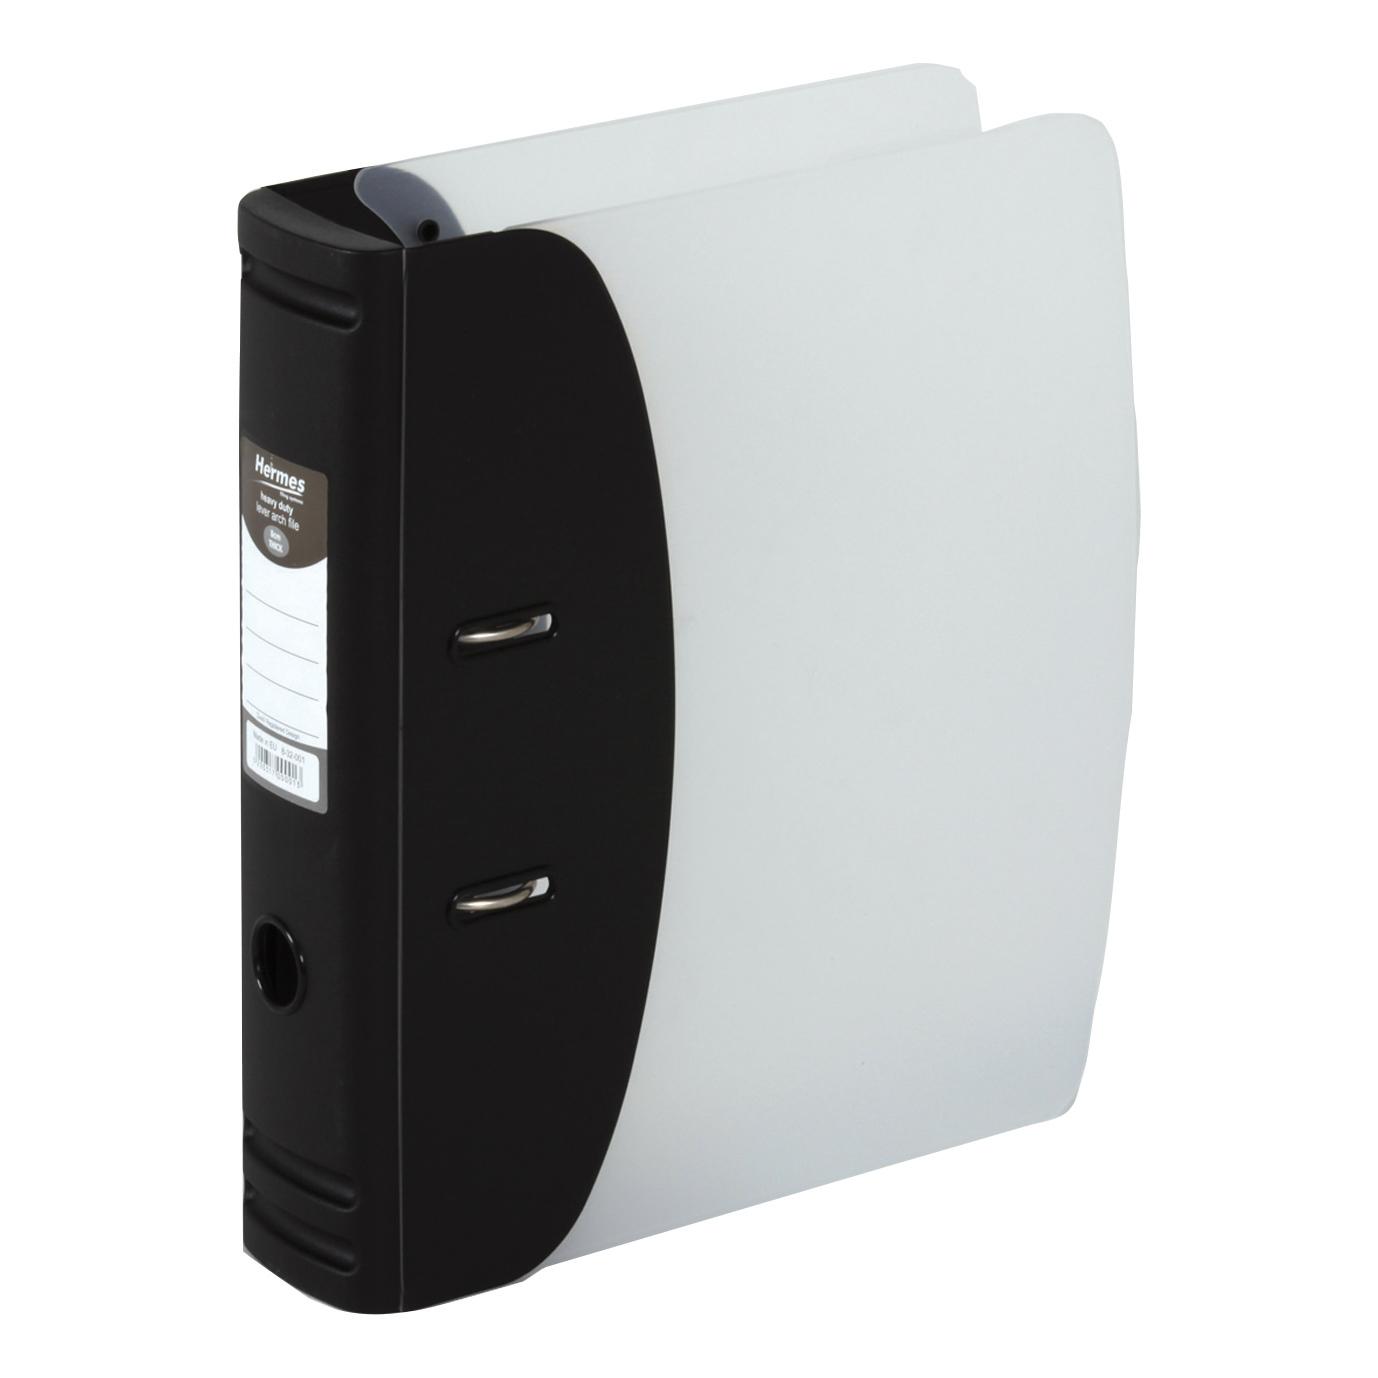 Lever arch file Hermes Lever Arch File Polypropylene 80mm A4 Black Ref 832001